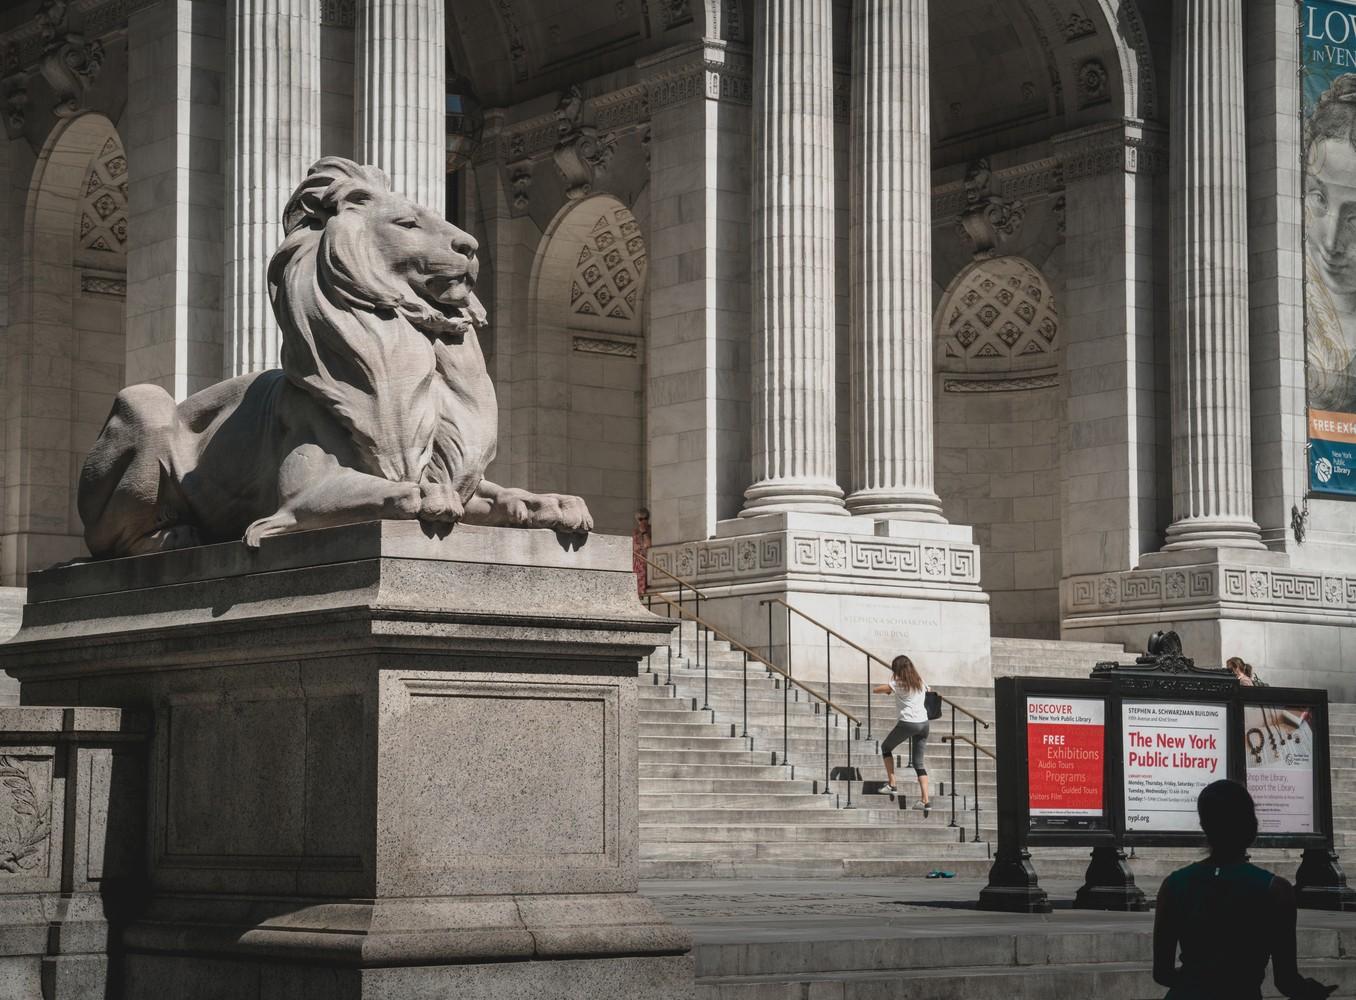 The New York Public Library | LinkedIn